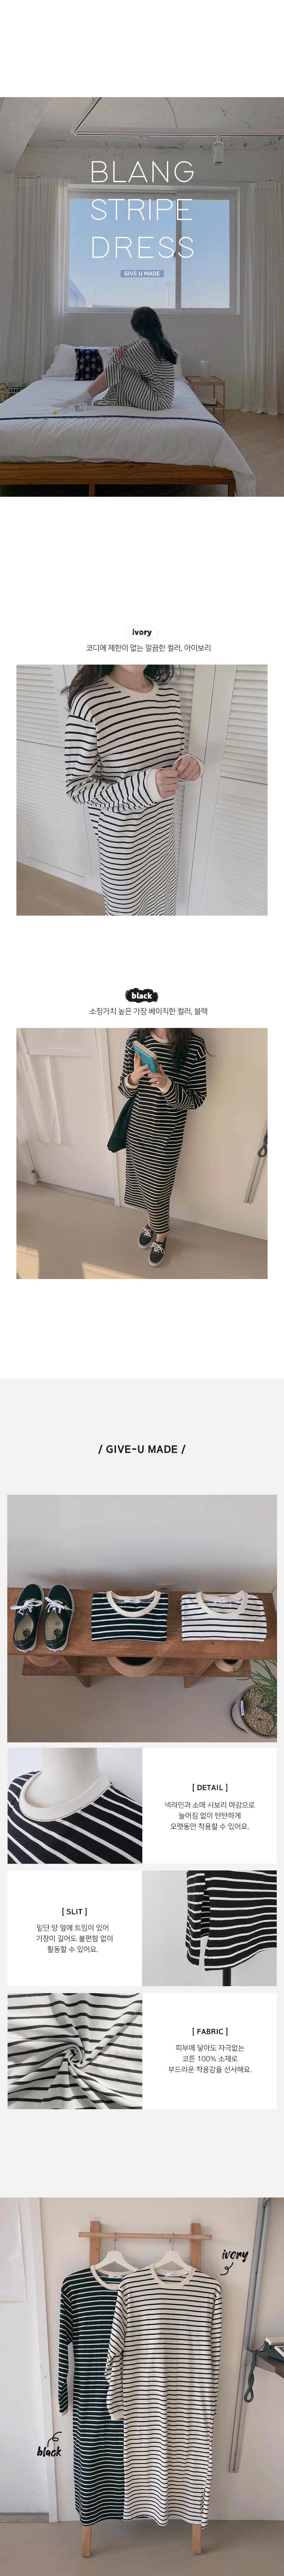 Blanc Stripe Pajama Dress